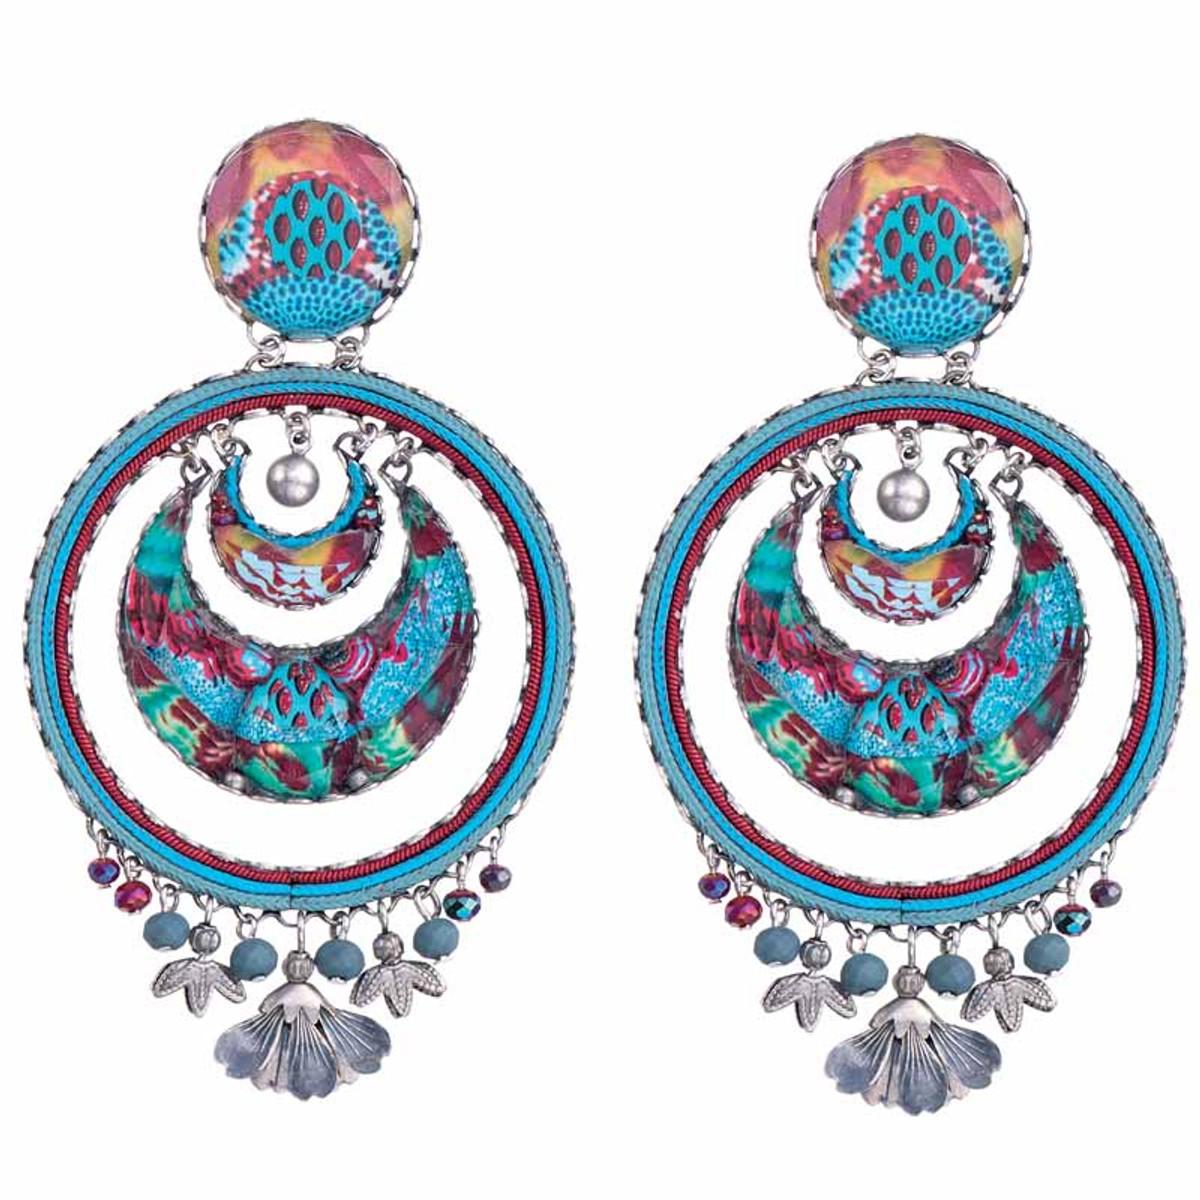 Ayala Bar Blue Castle Camila Earrings